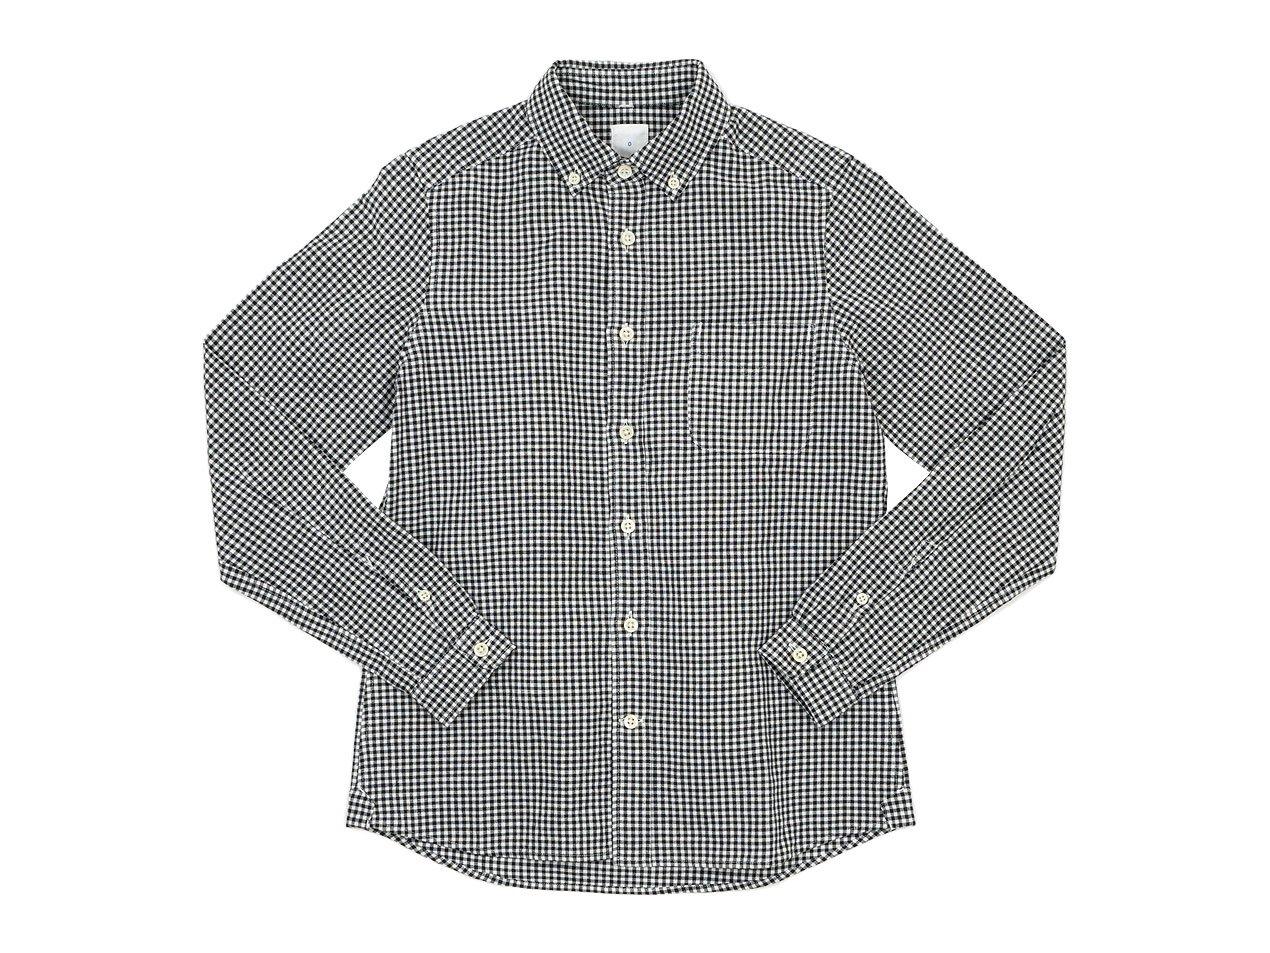 maillot sunset gingham B.D. shirts BLACK x WHITE